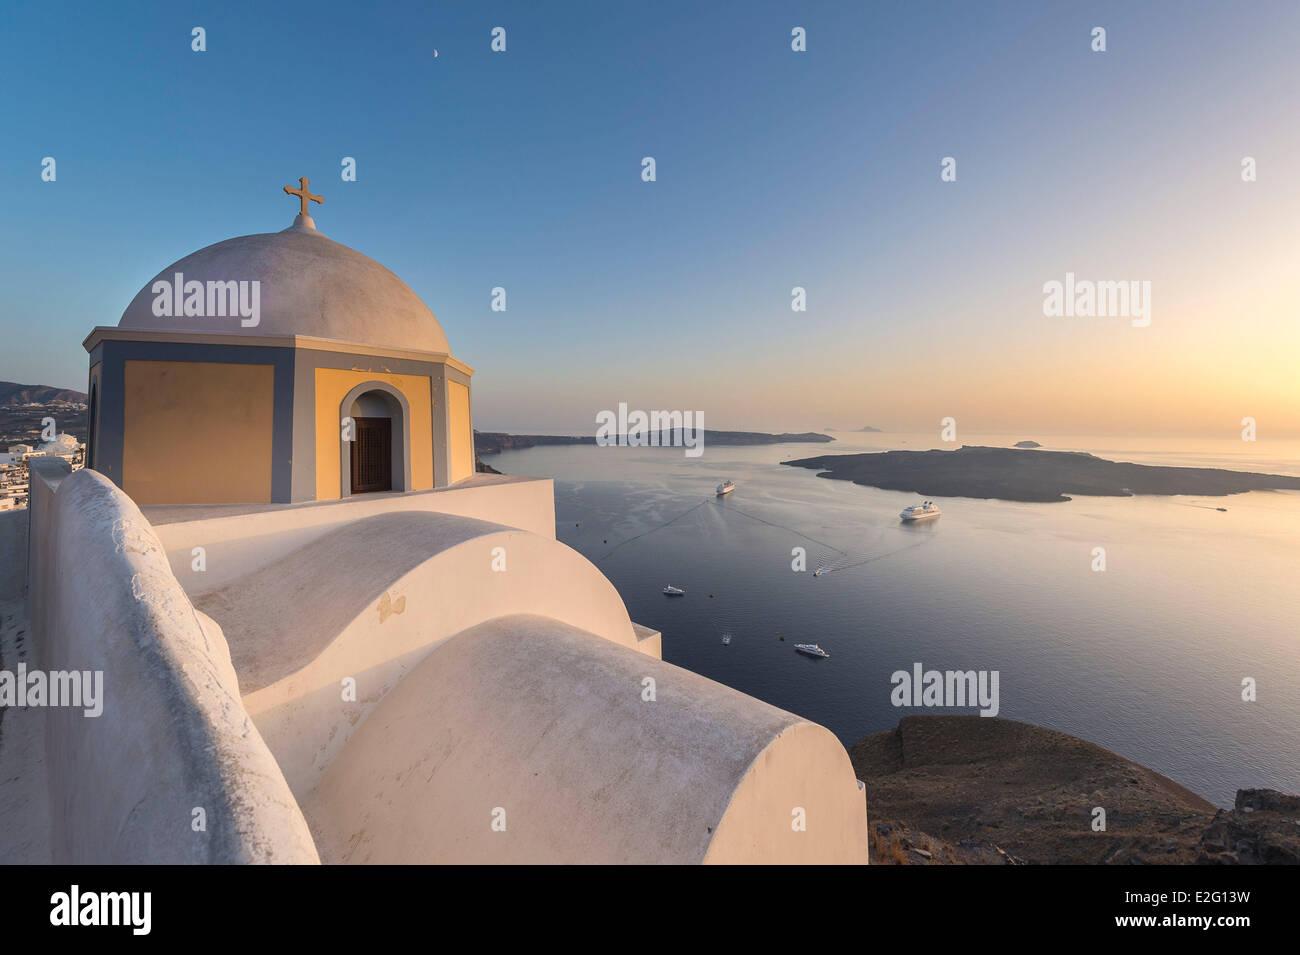 Las Islas Cícladas de Grecia la isla de Santorini (Thira) iglesia en Fira. Foto de stock